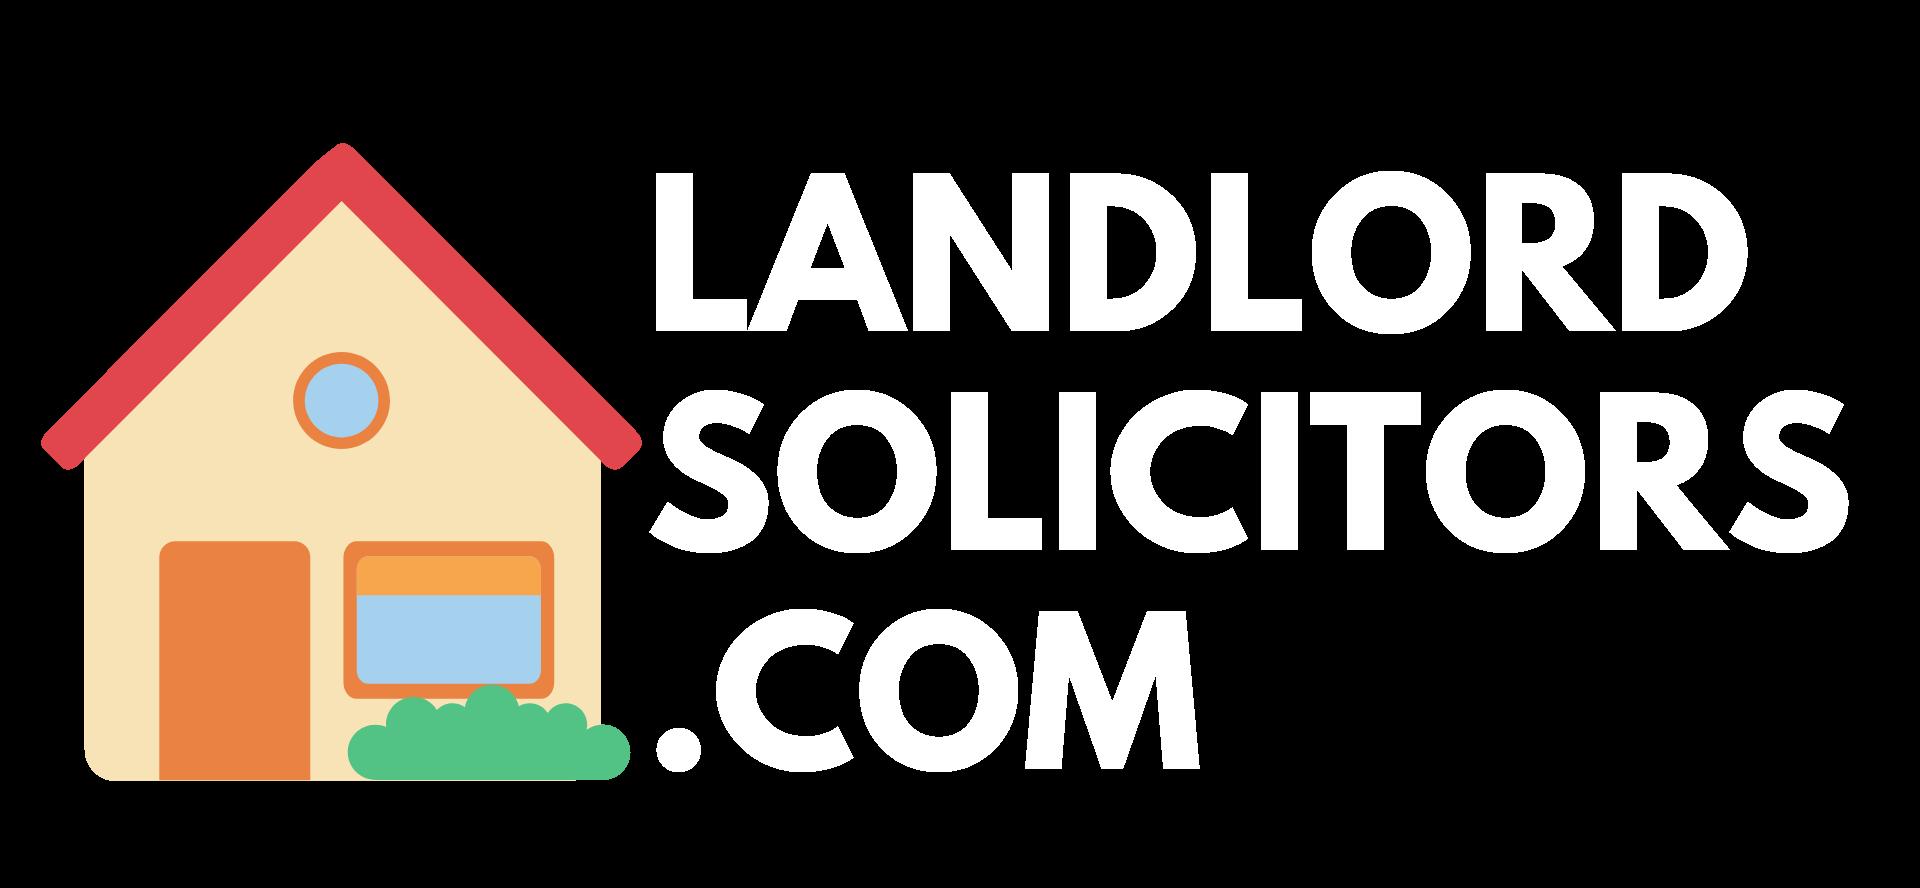 LandlordSolicitors Logo